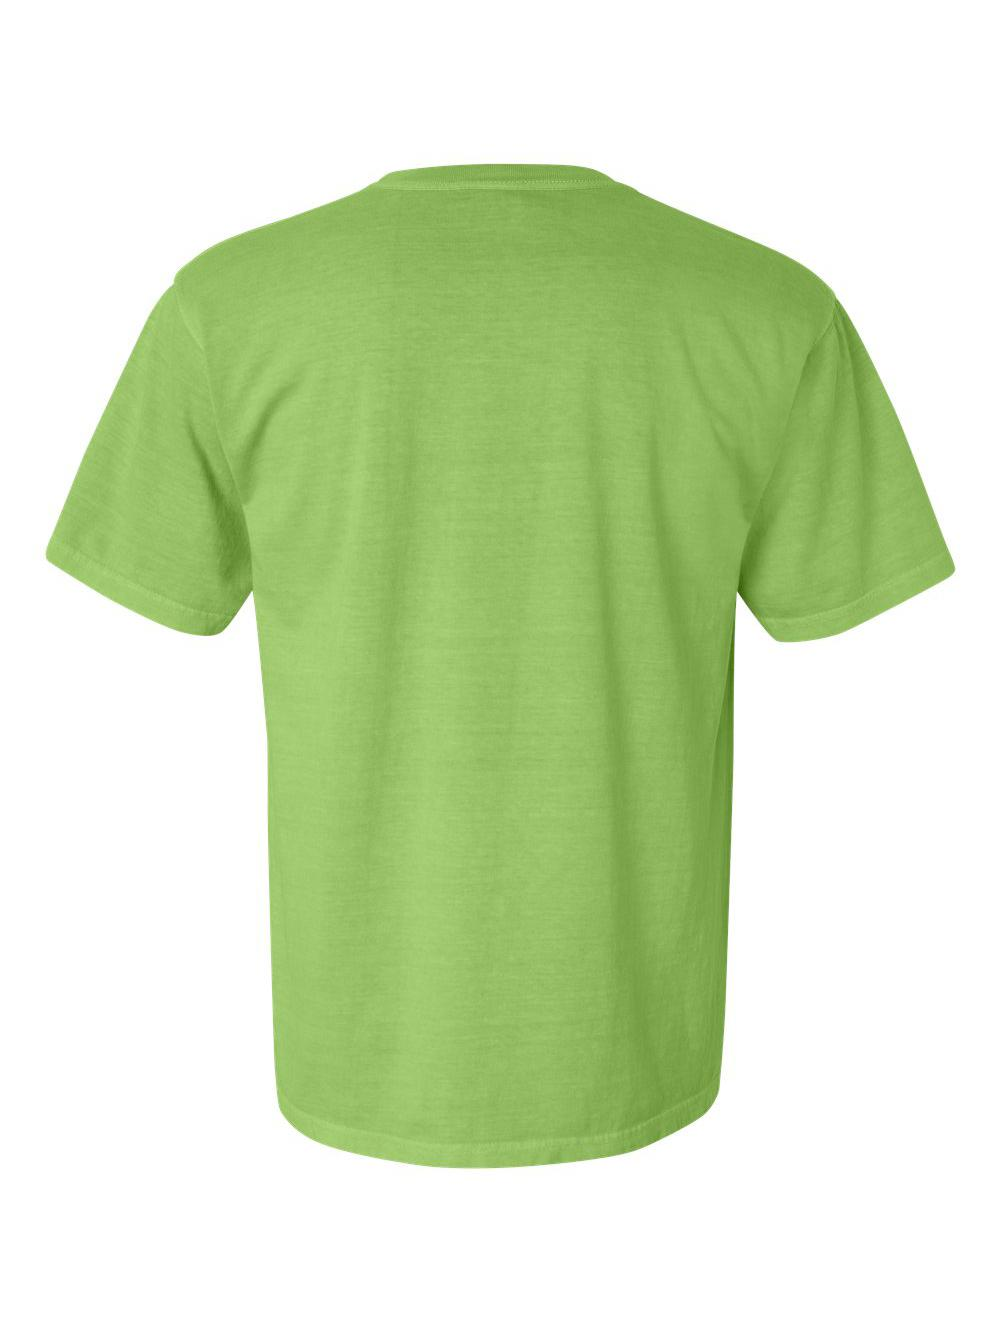 Comfort-Colors-Garment-Dyed-Heavyweight-Ringspun-Short-Sleeve-Shirt-1717 thumbnail 76